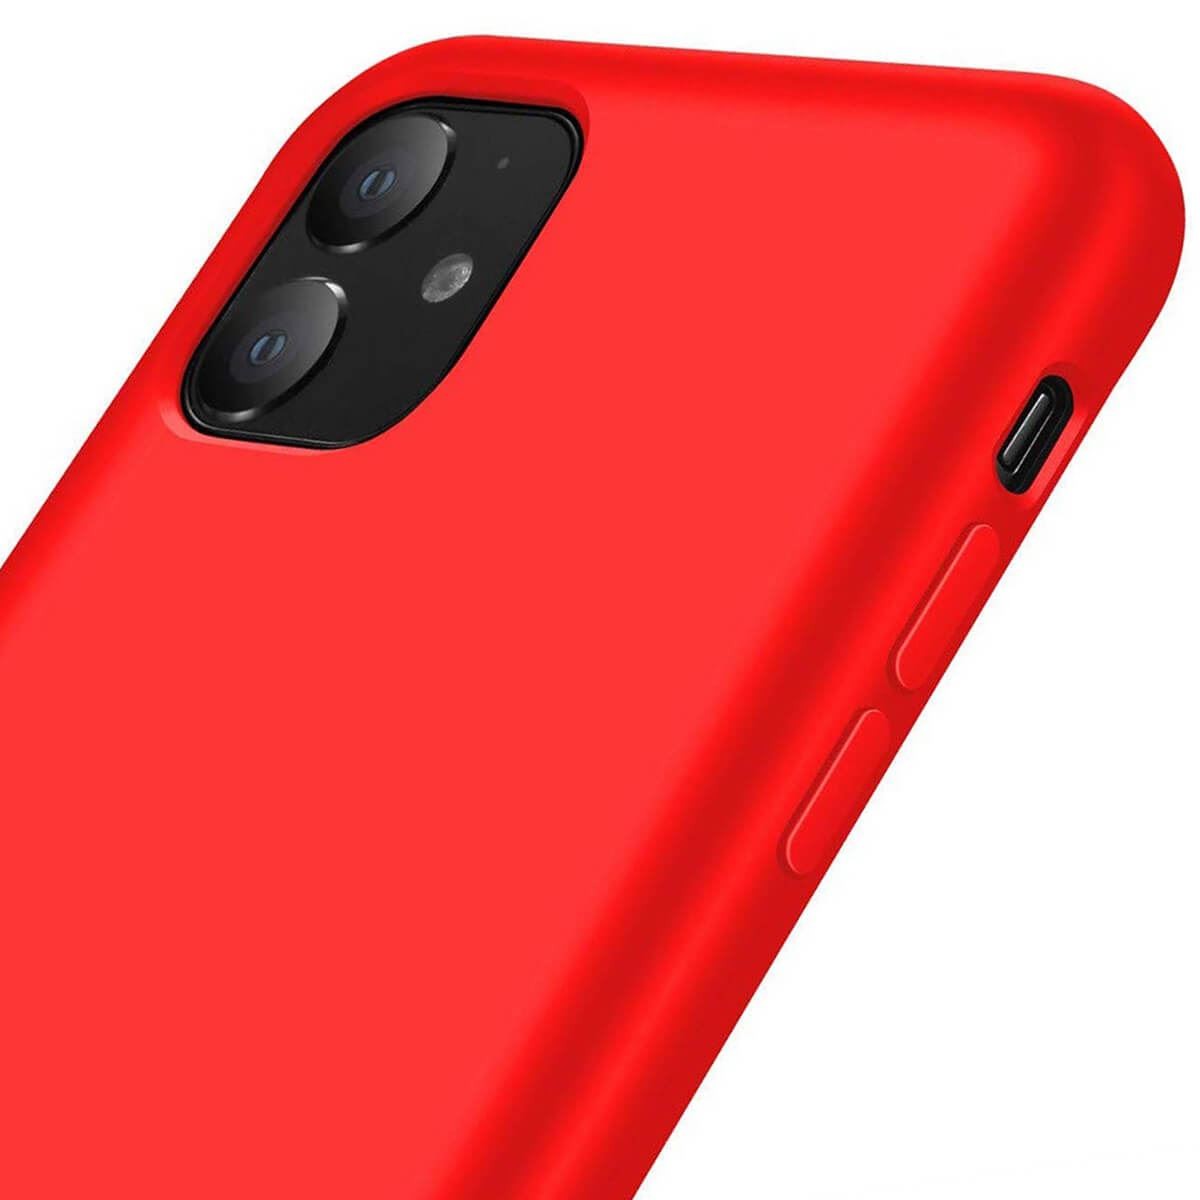 Leather-Slim-Case-Apple-iPhone-10-8-7-Plus-6s-5-Original-PU-Soft-Silicone-Cover thumbnail 26